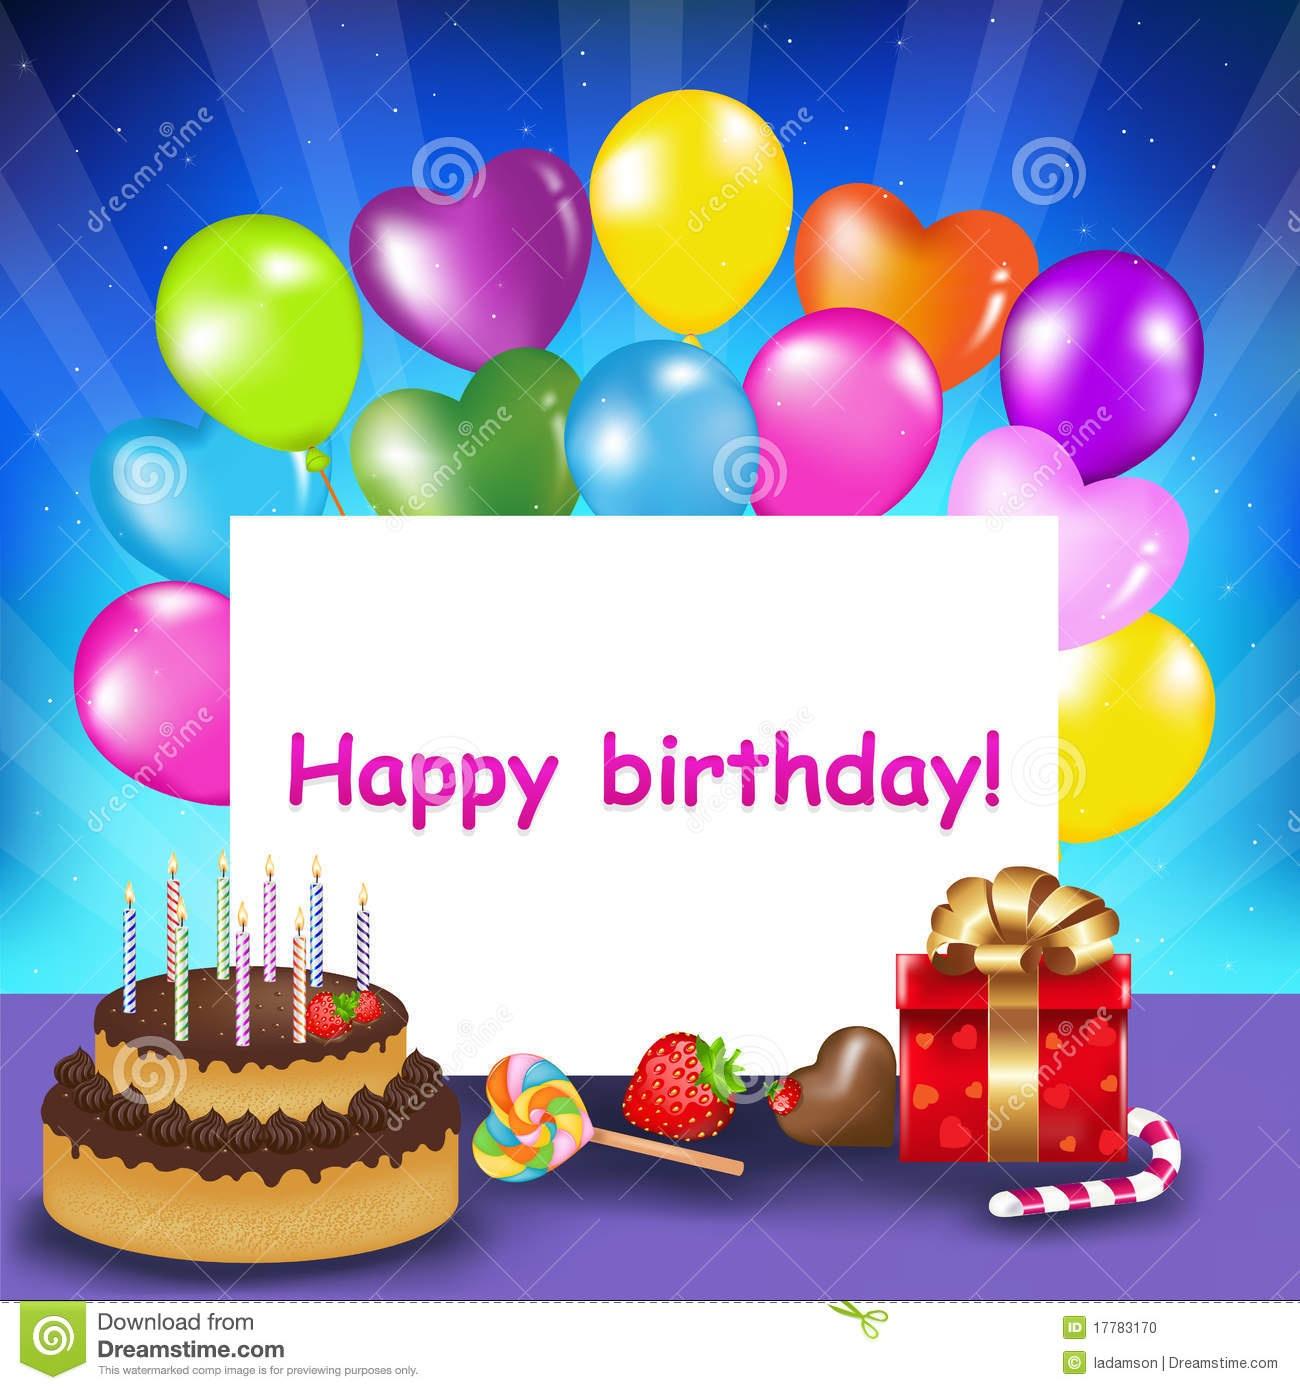 91+ Happy Birthday Custom Cards Free - Happy Birthday Gift Cards - Free Printable Happy Birthday Cards Online